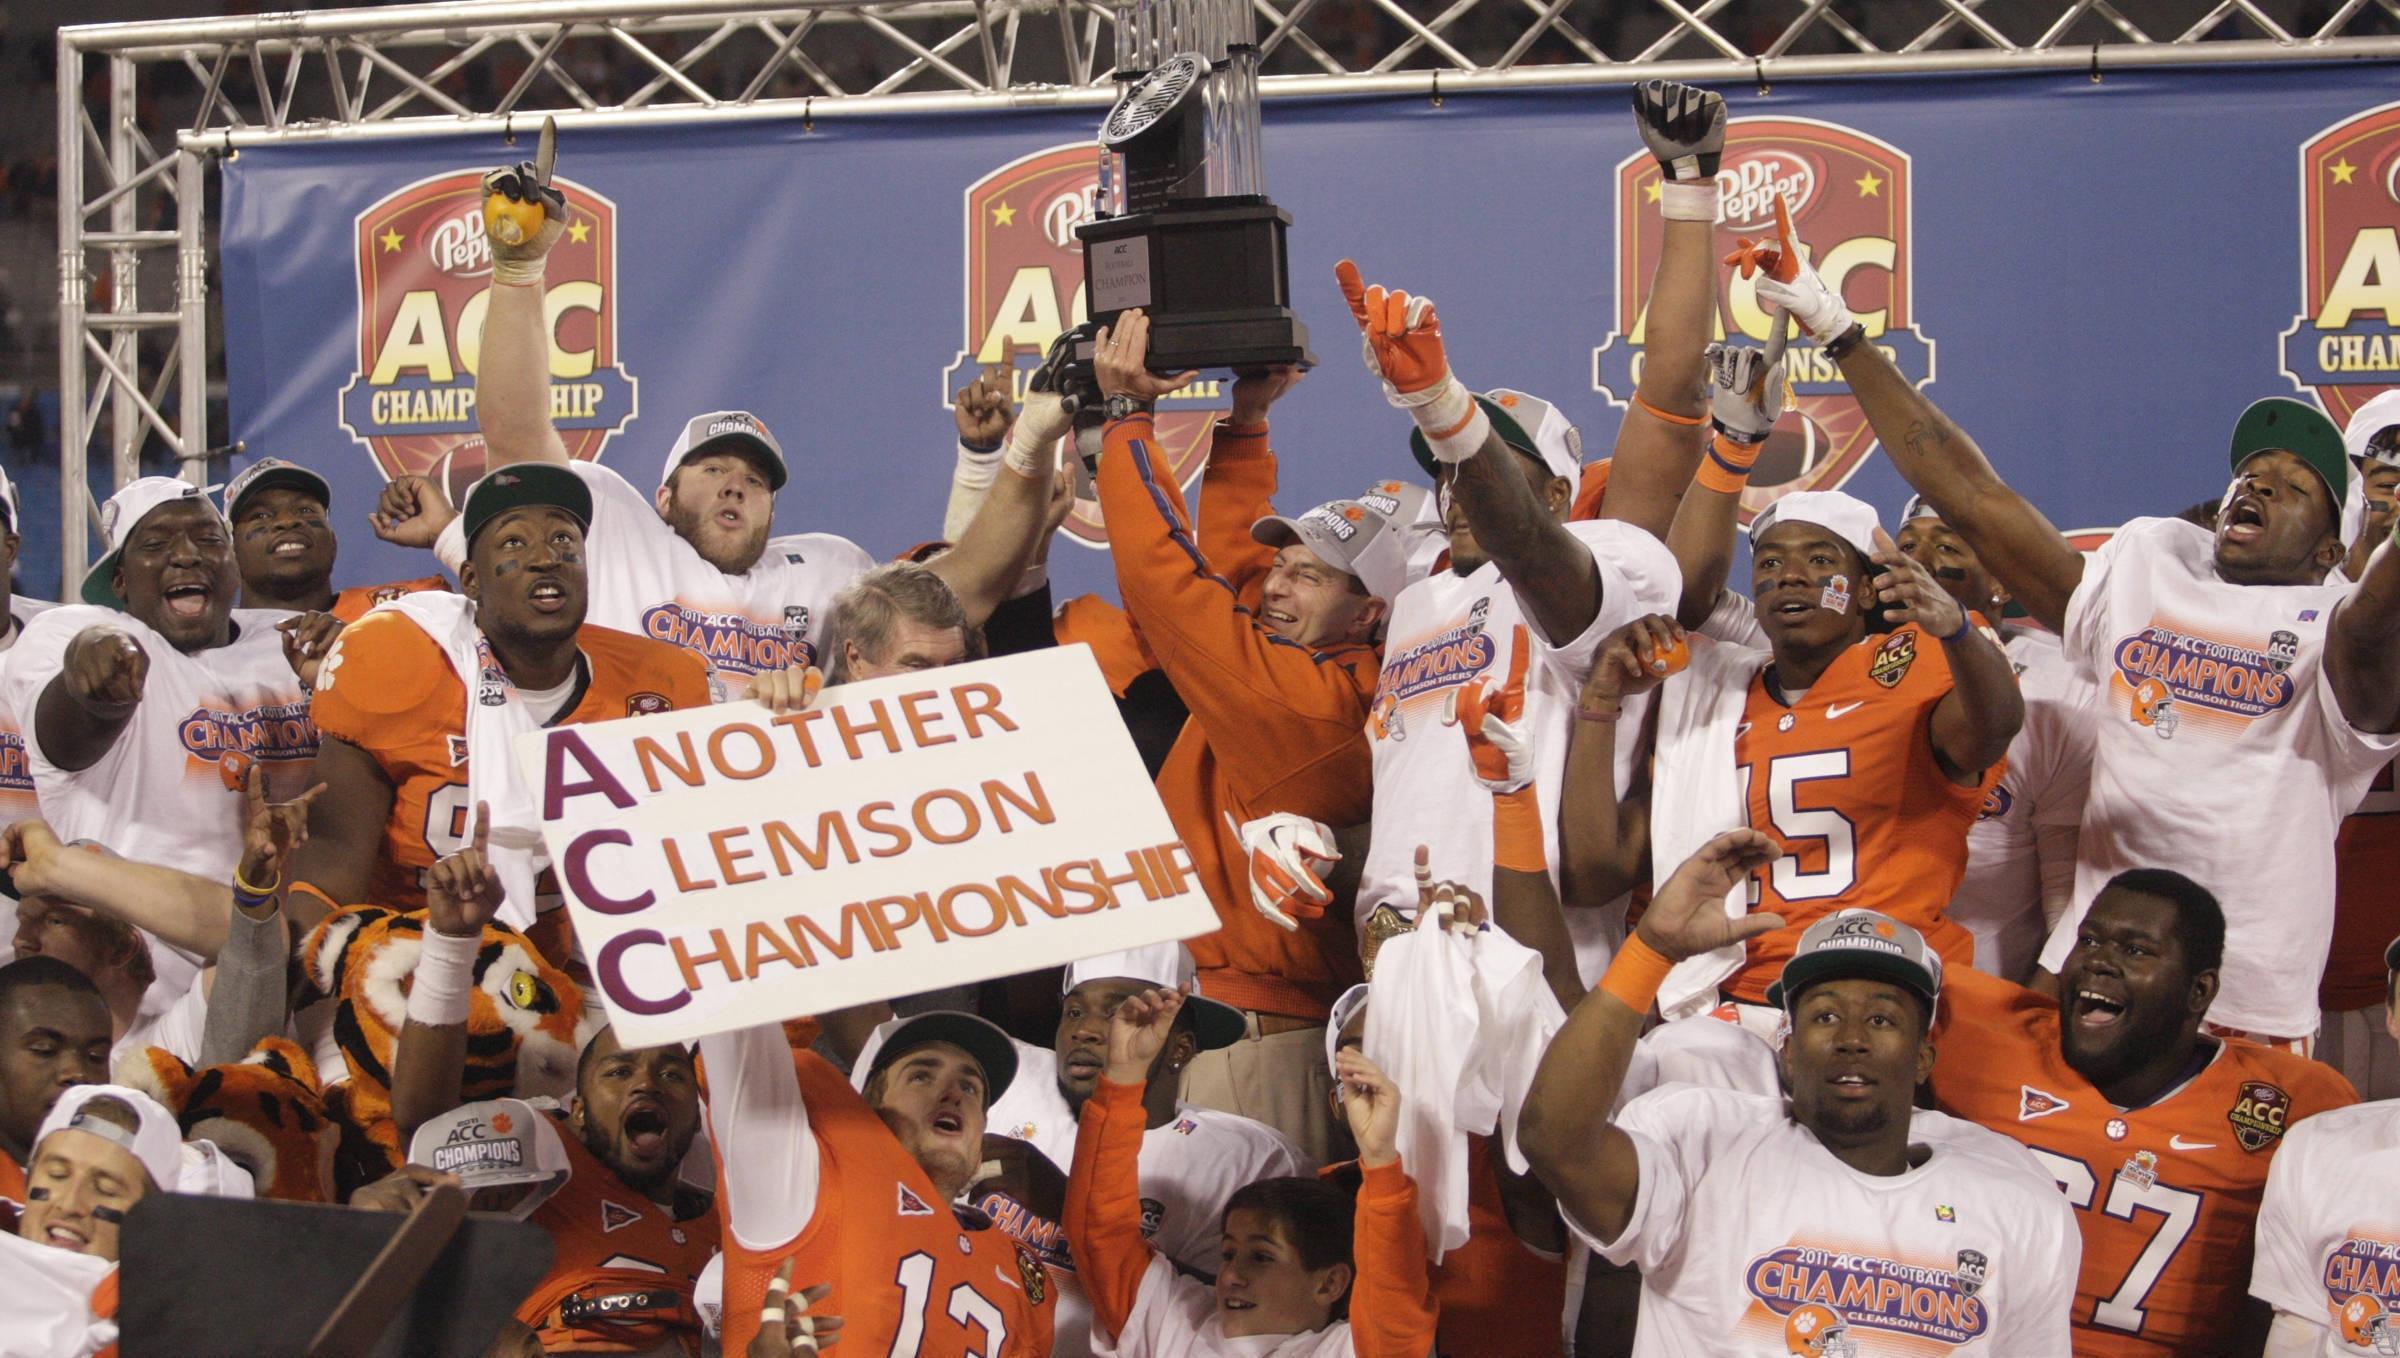 2011 Clemson Football Season Highlight Video